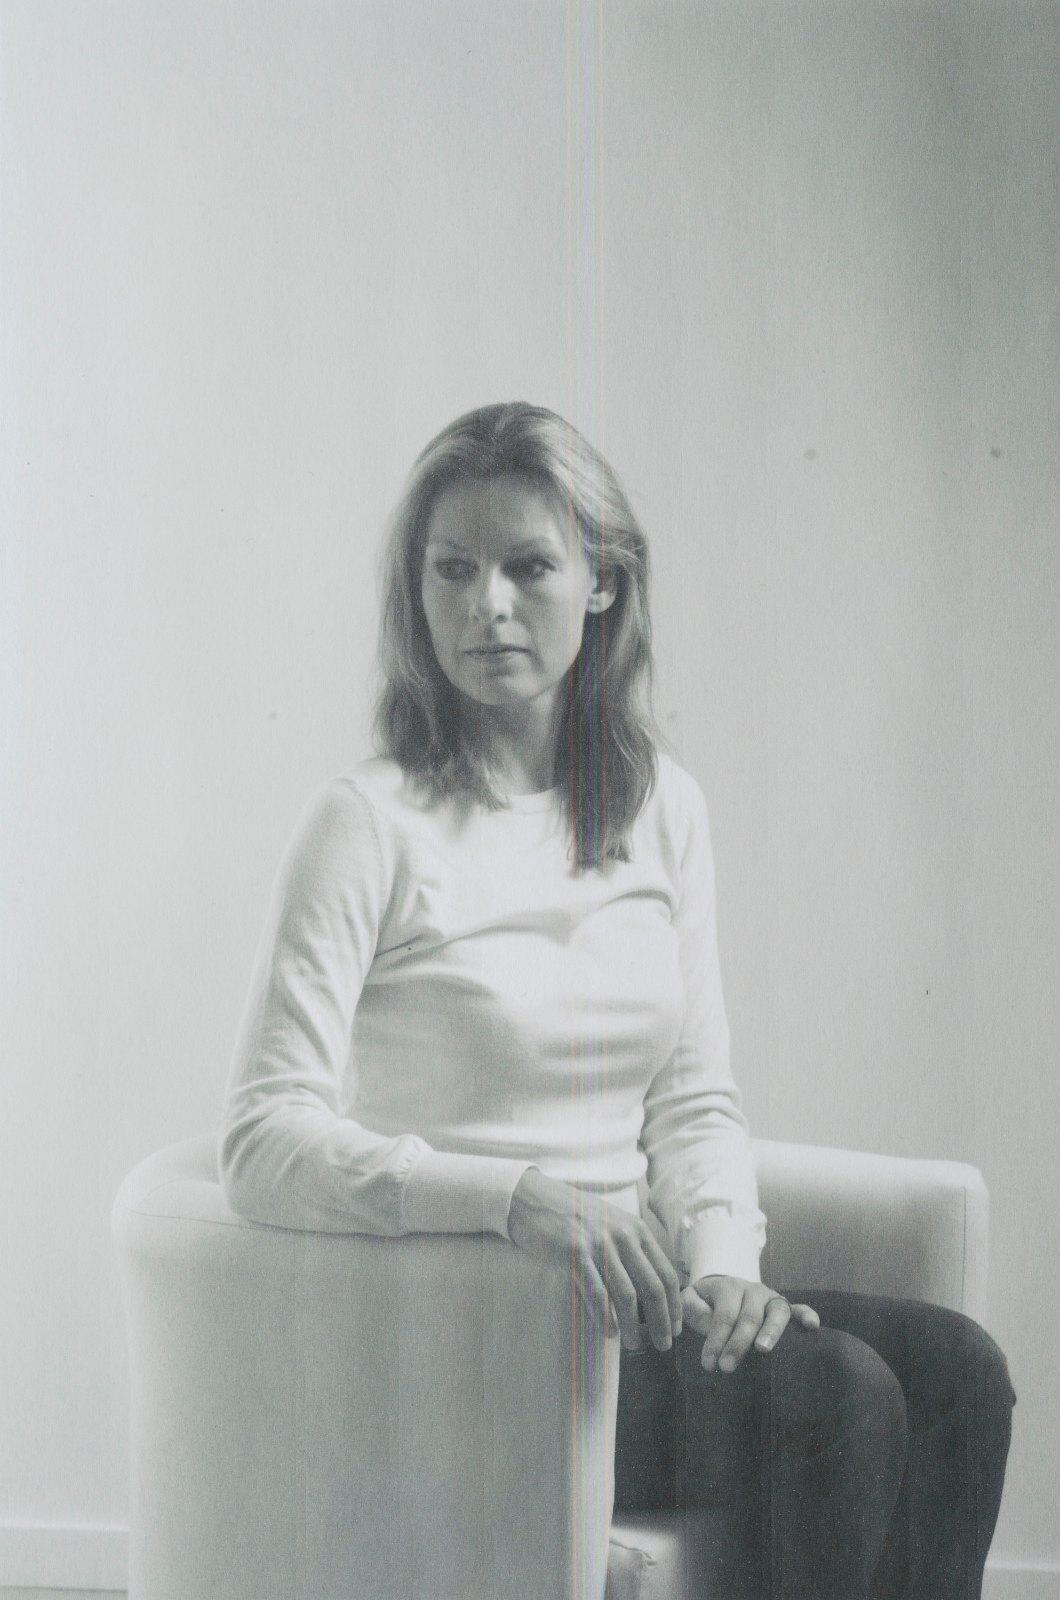 Nina (xerox), 2013, Gicleé print, 50 x 33,2 cm, Ed. 5